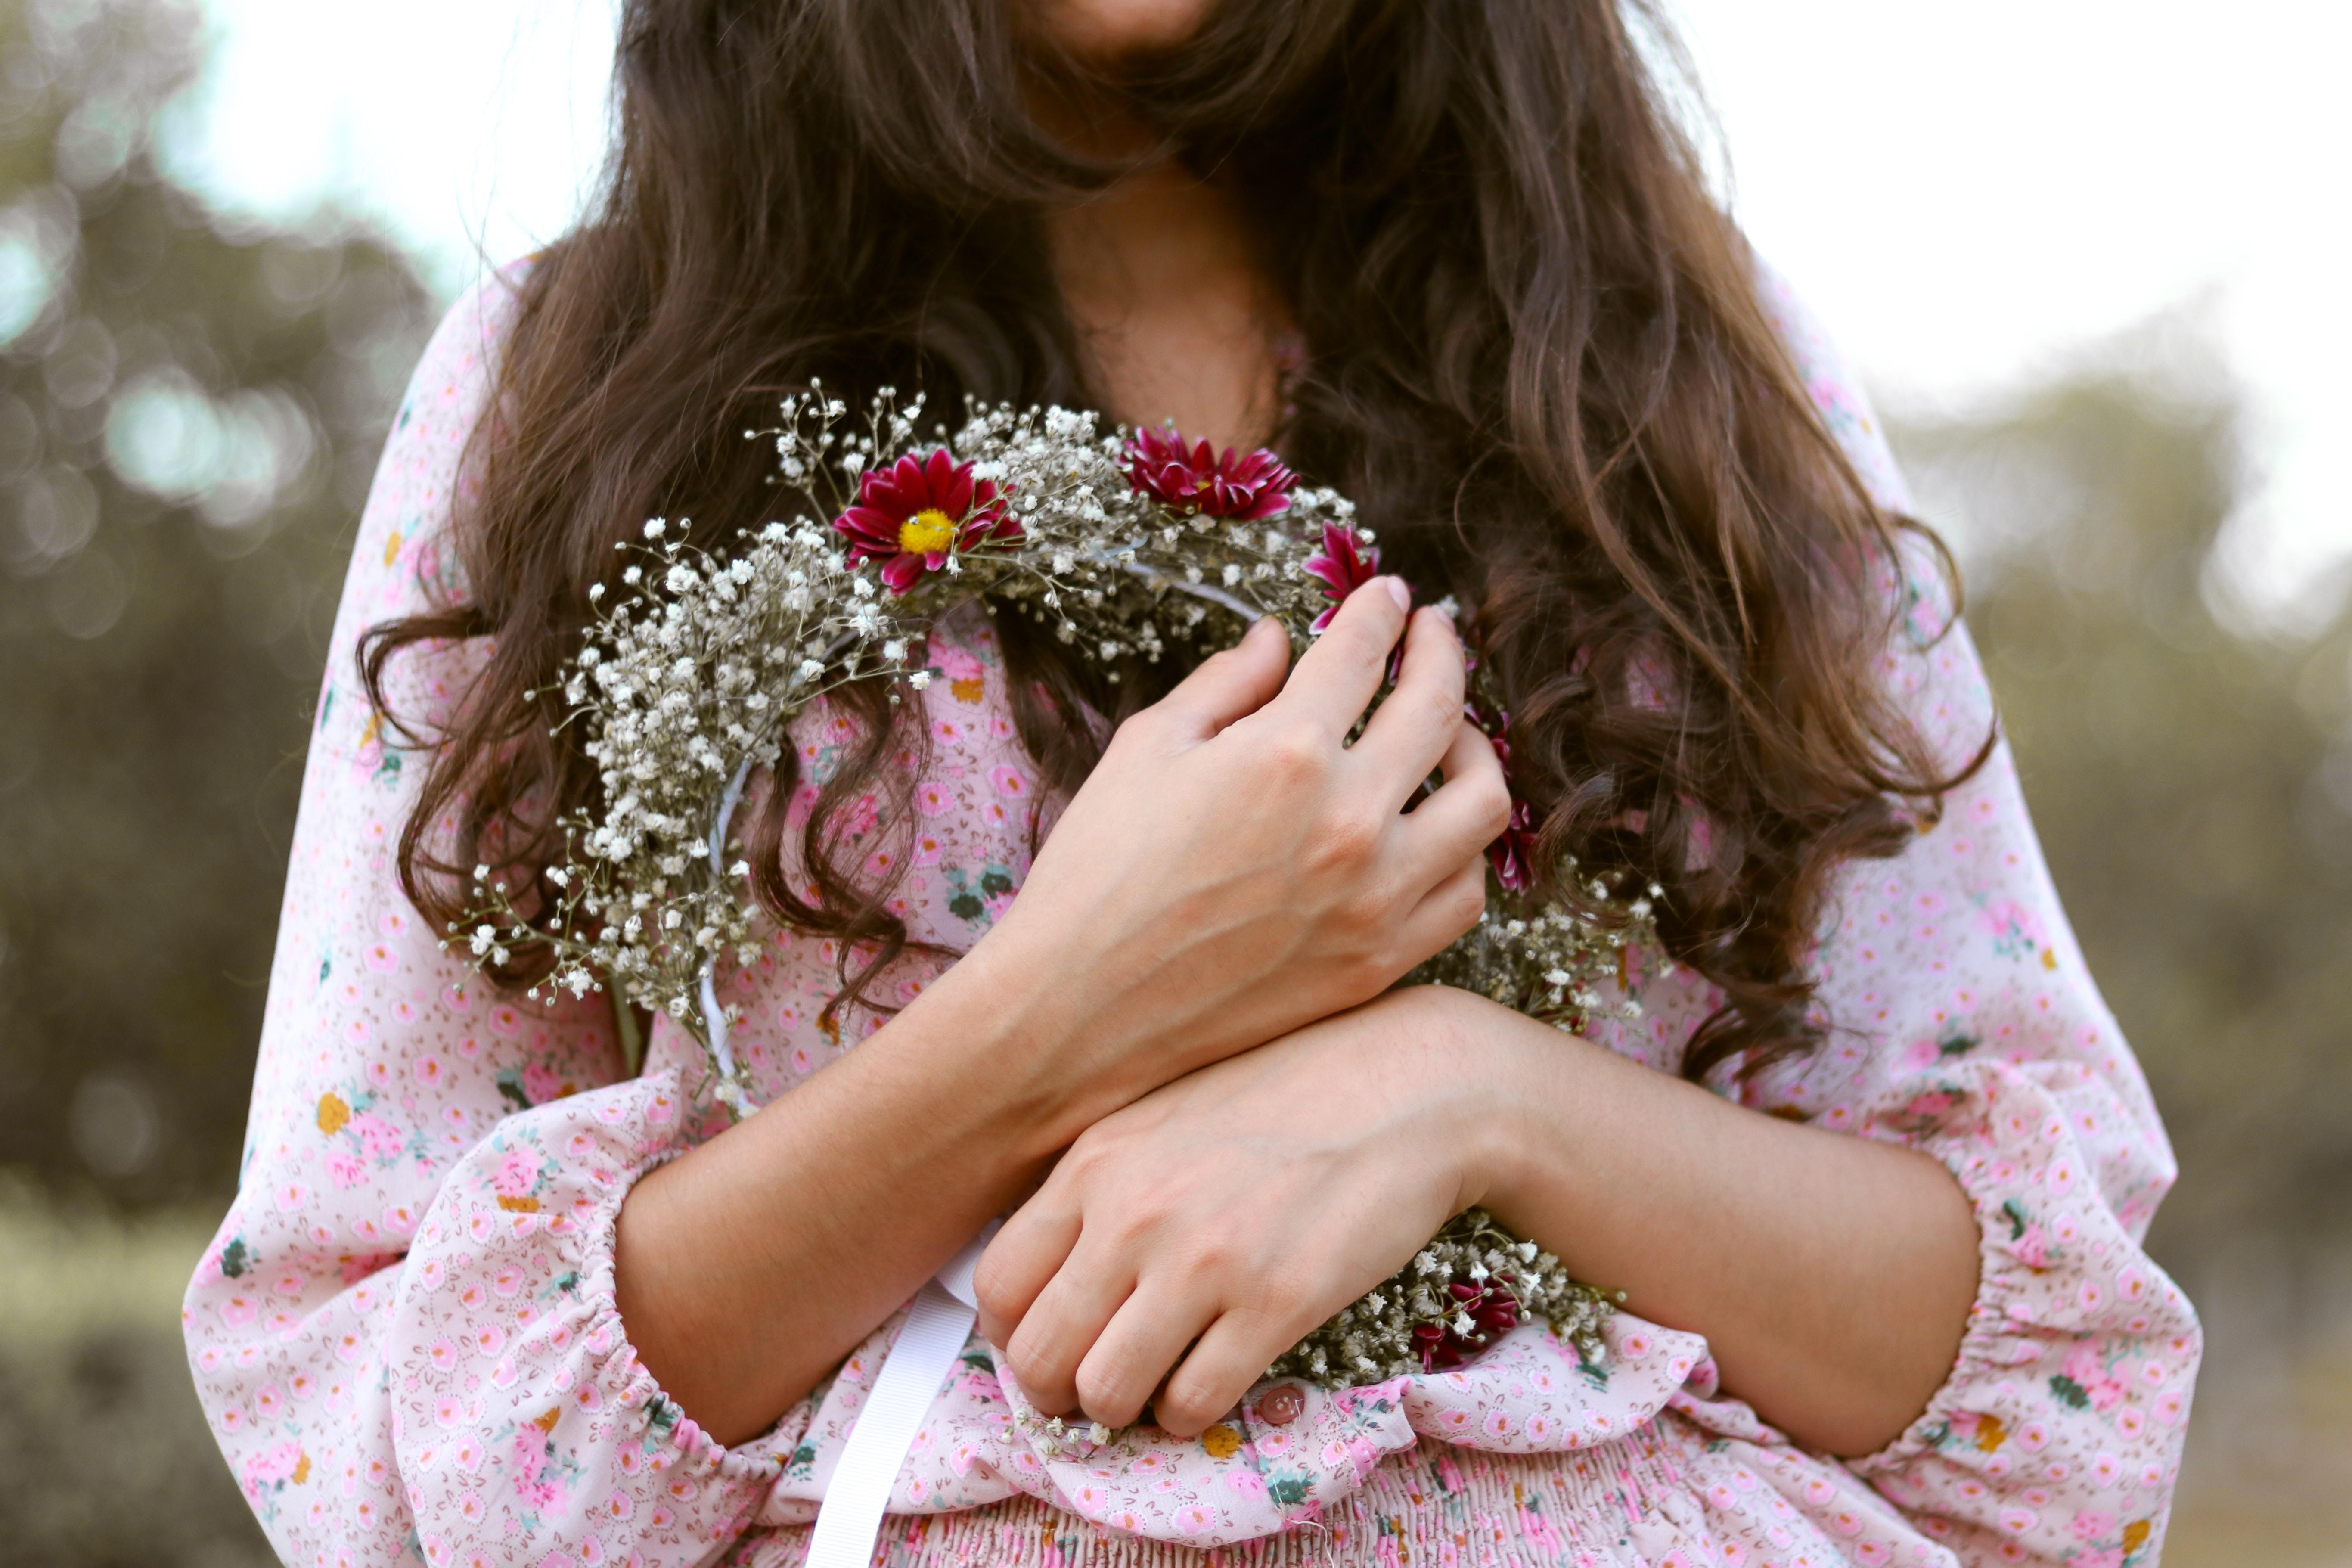 woman holding floral headband